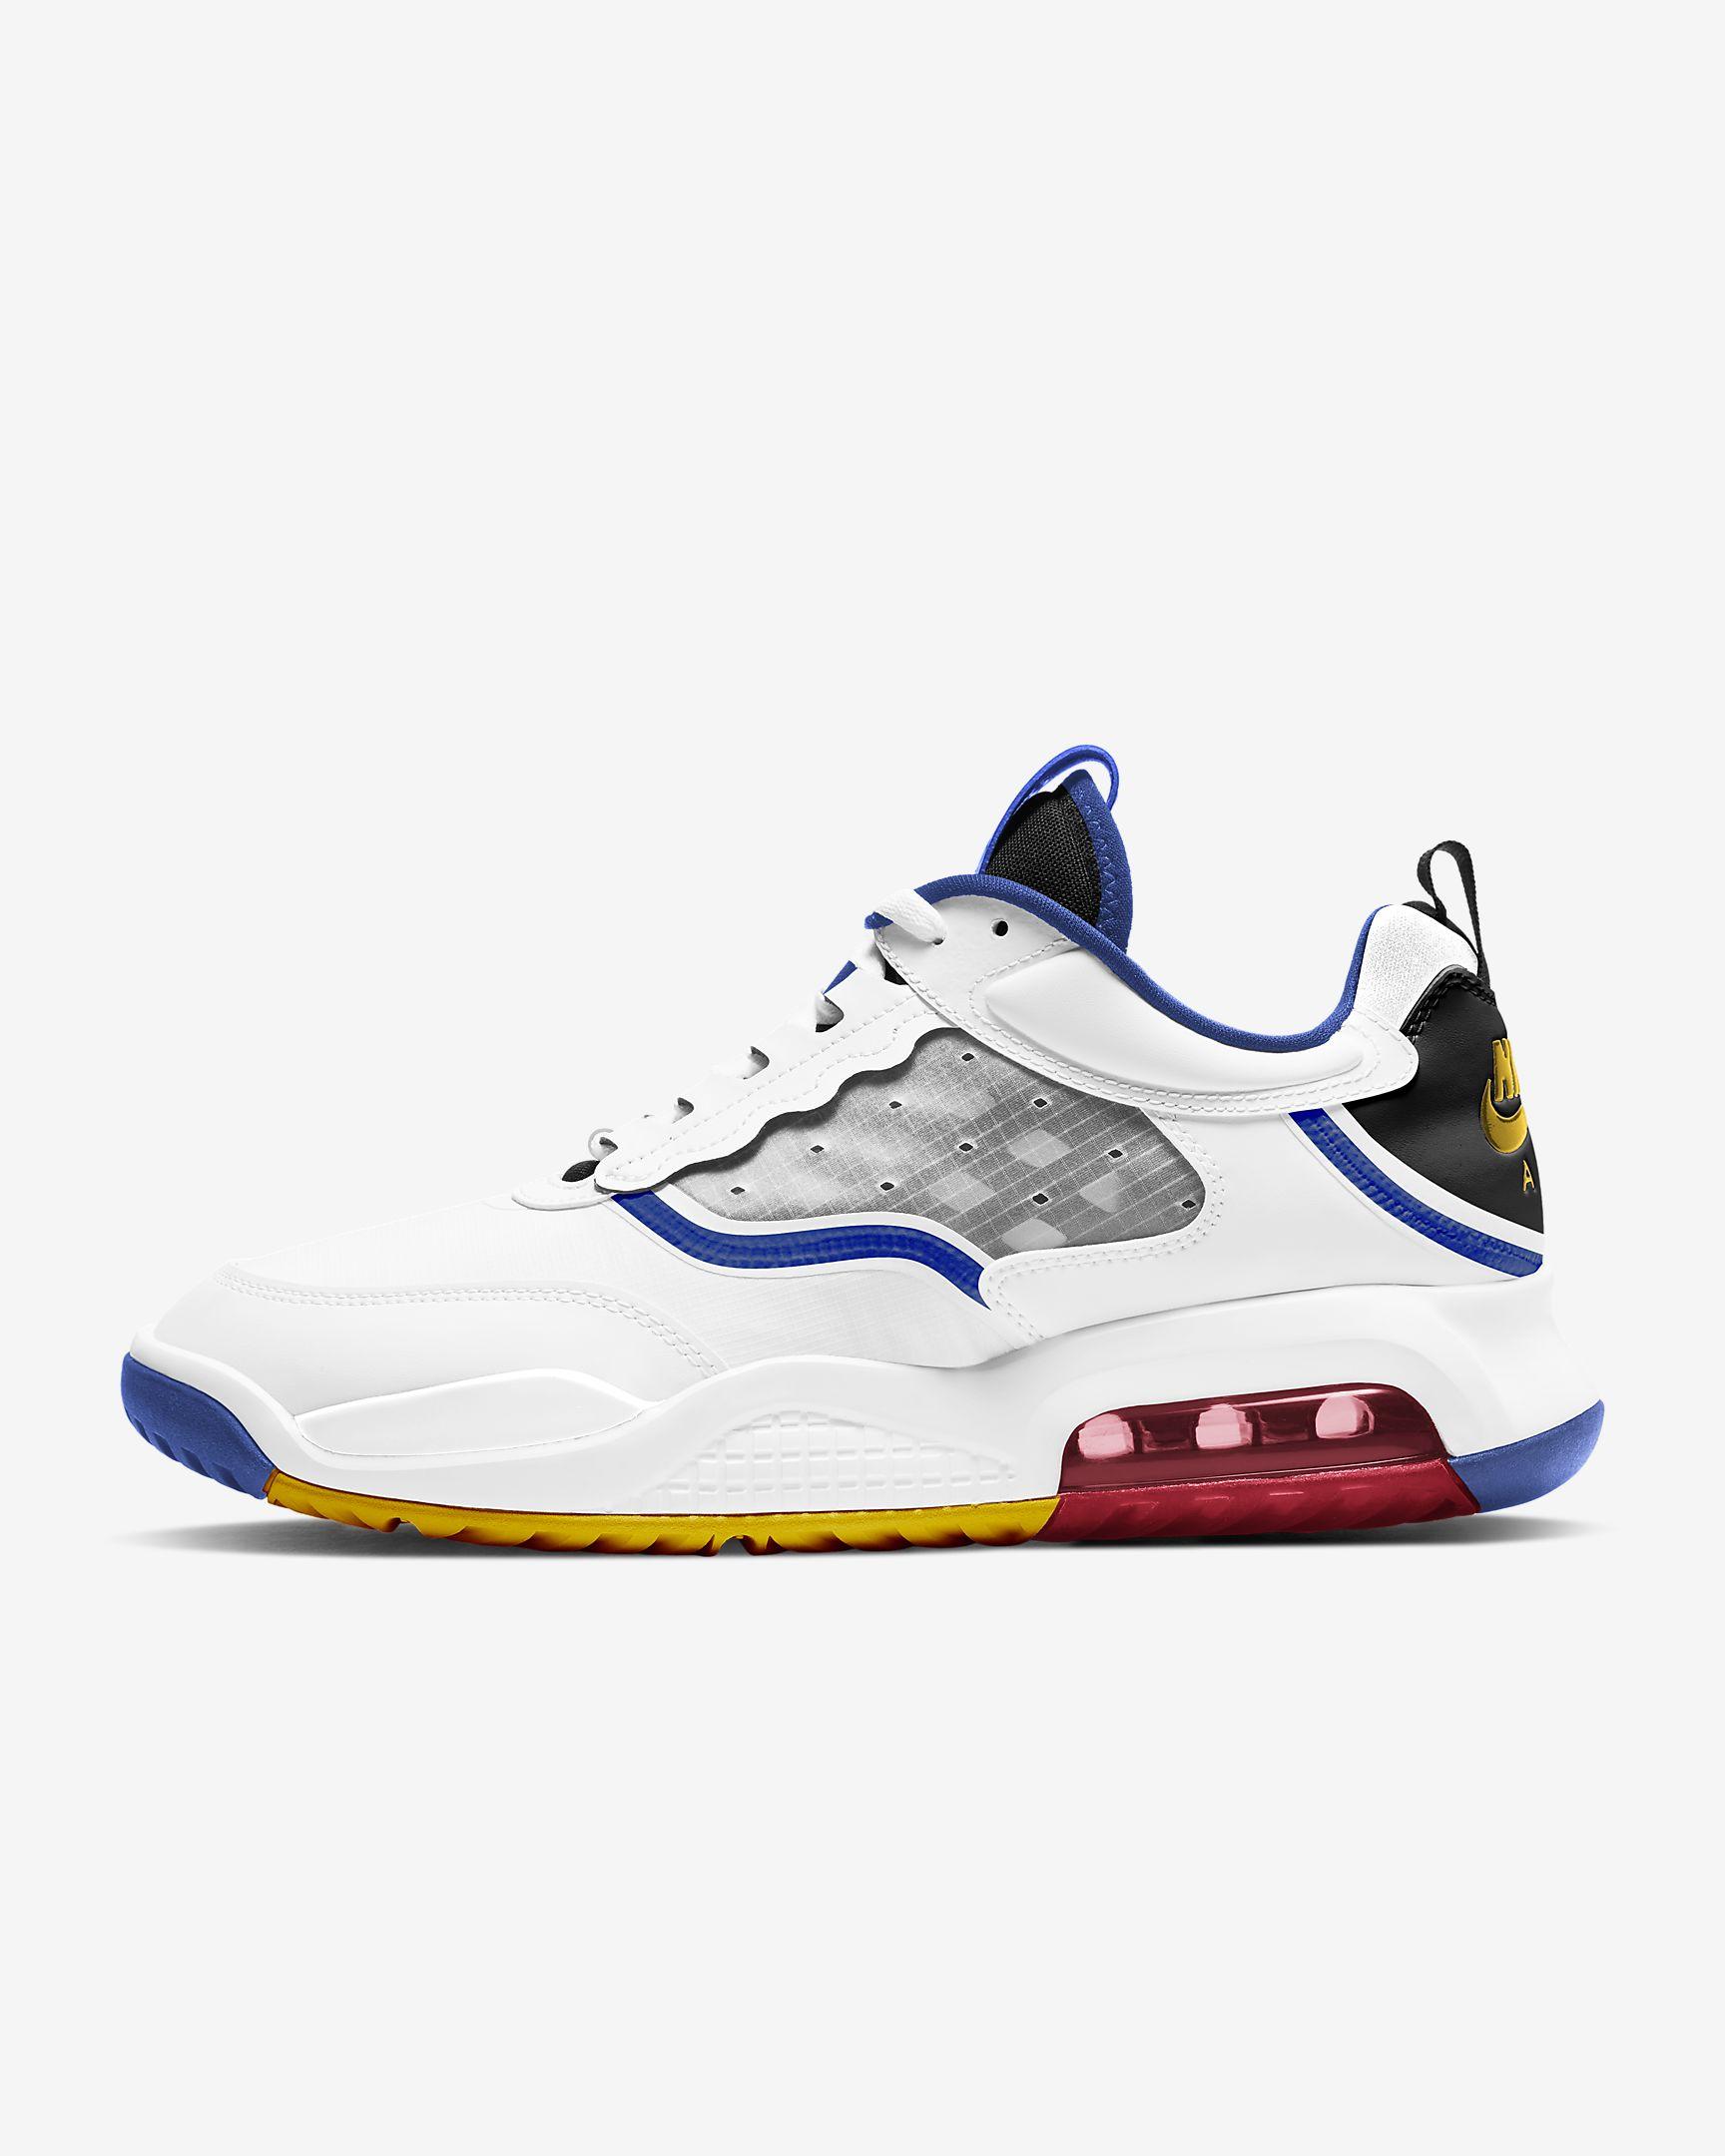 jordan-max-200, sneakers, week 35